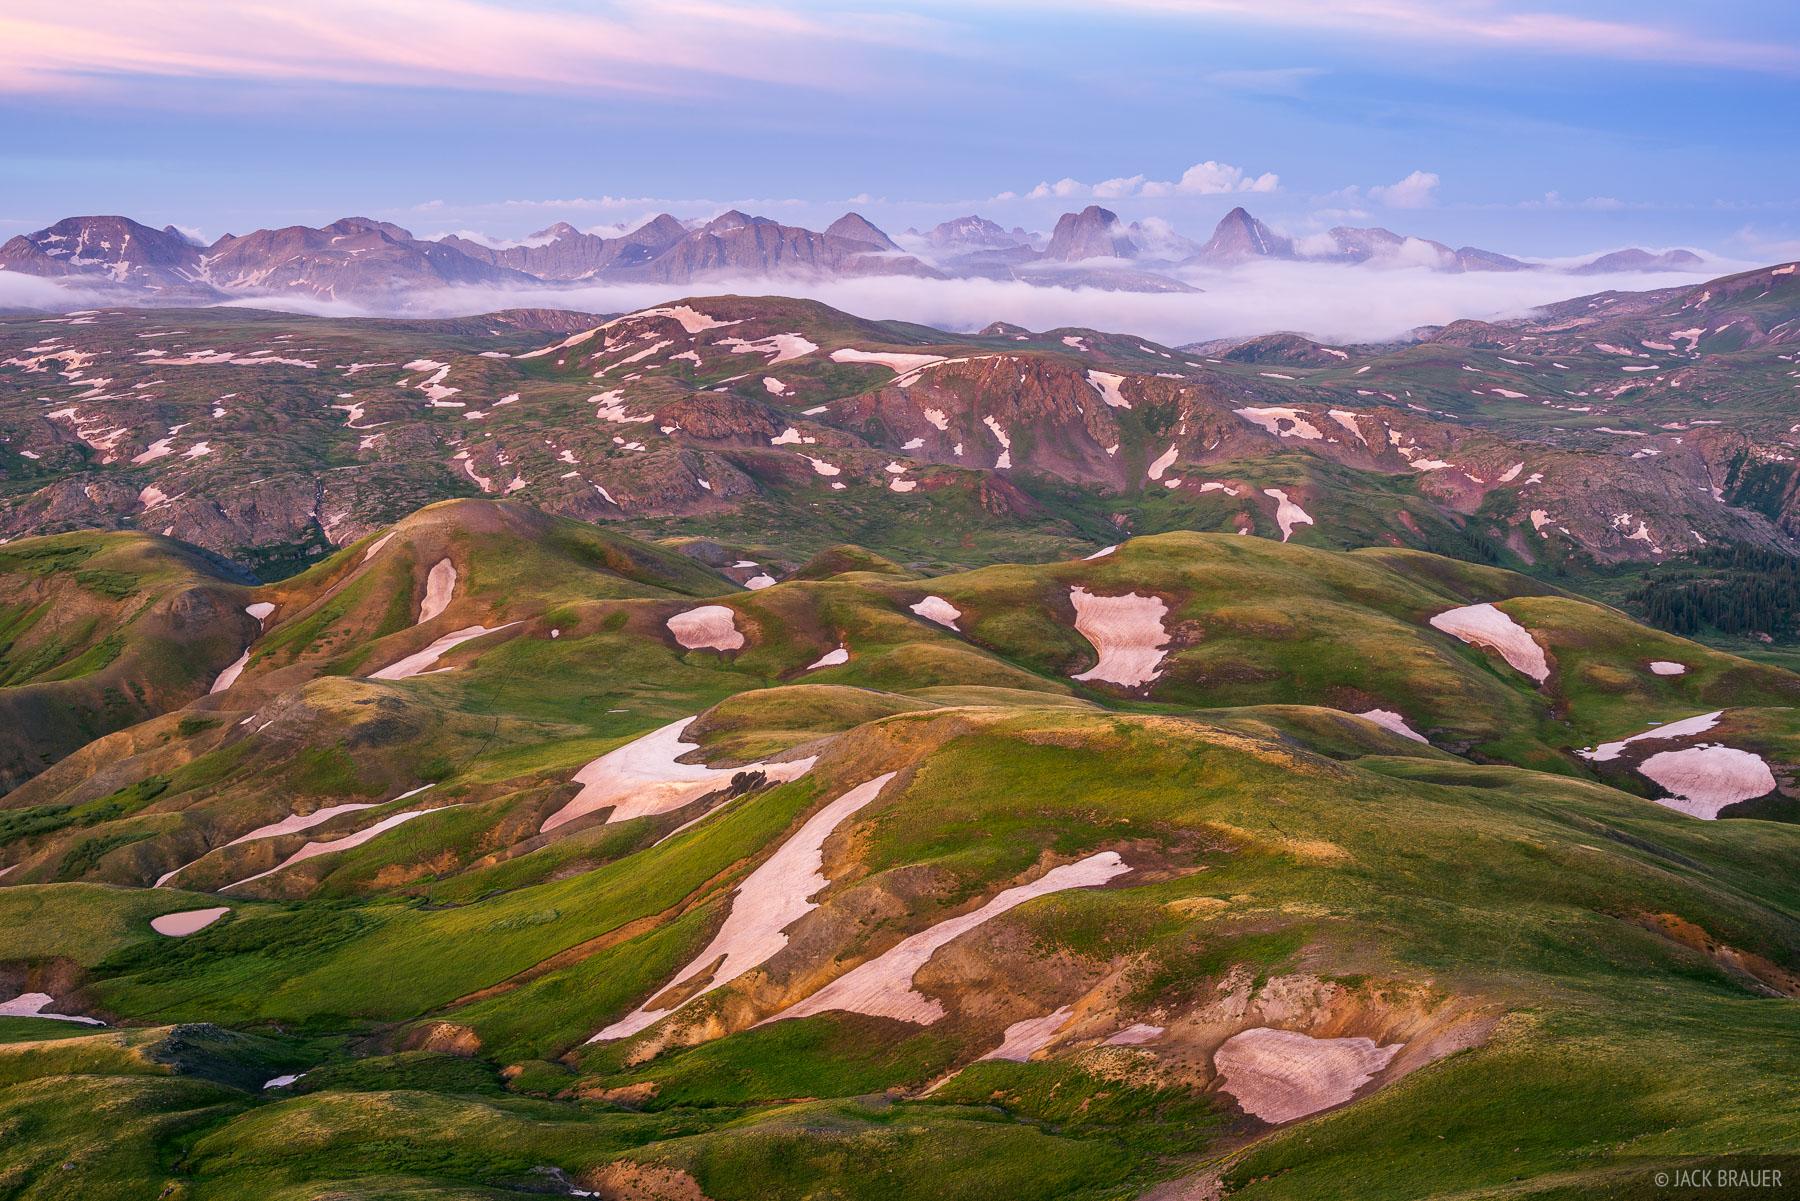 Colorado,Grenadier Range,San Juan Mountains,Stony Pass,Weminuche Wilderness, tundra, July, photo